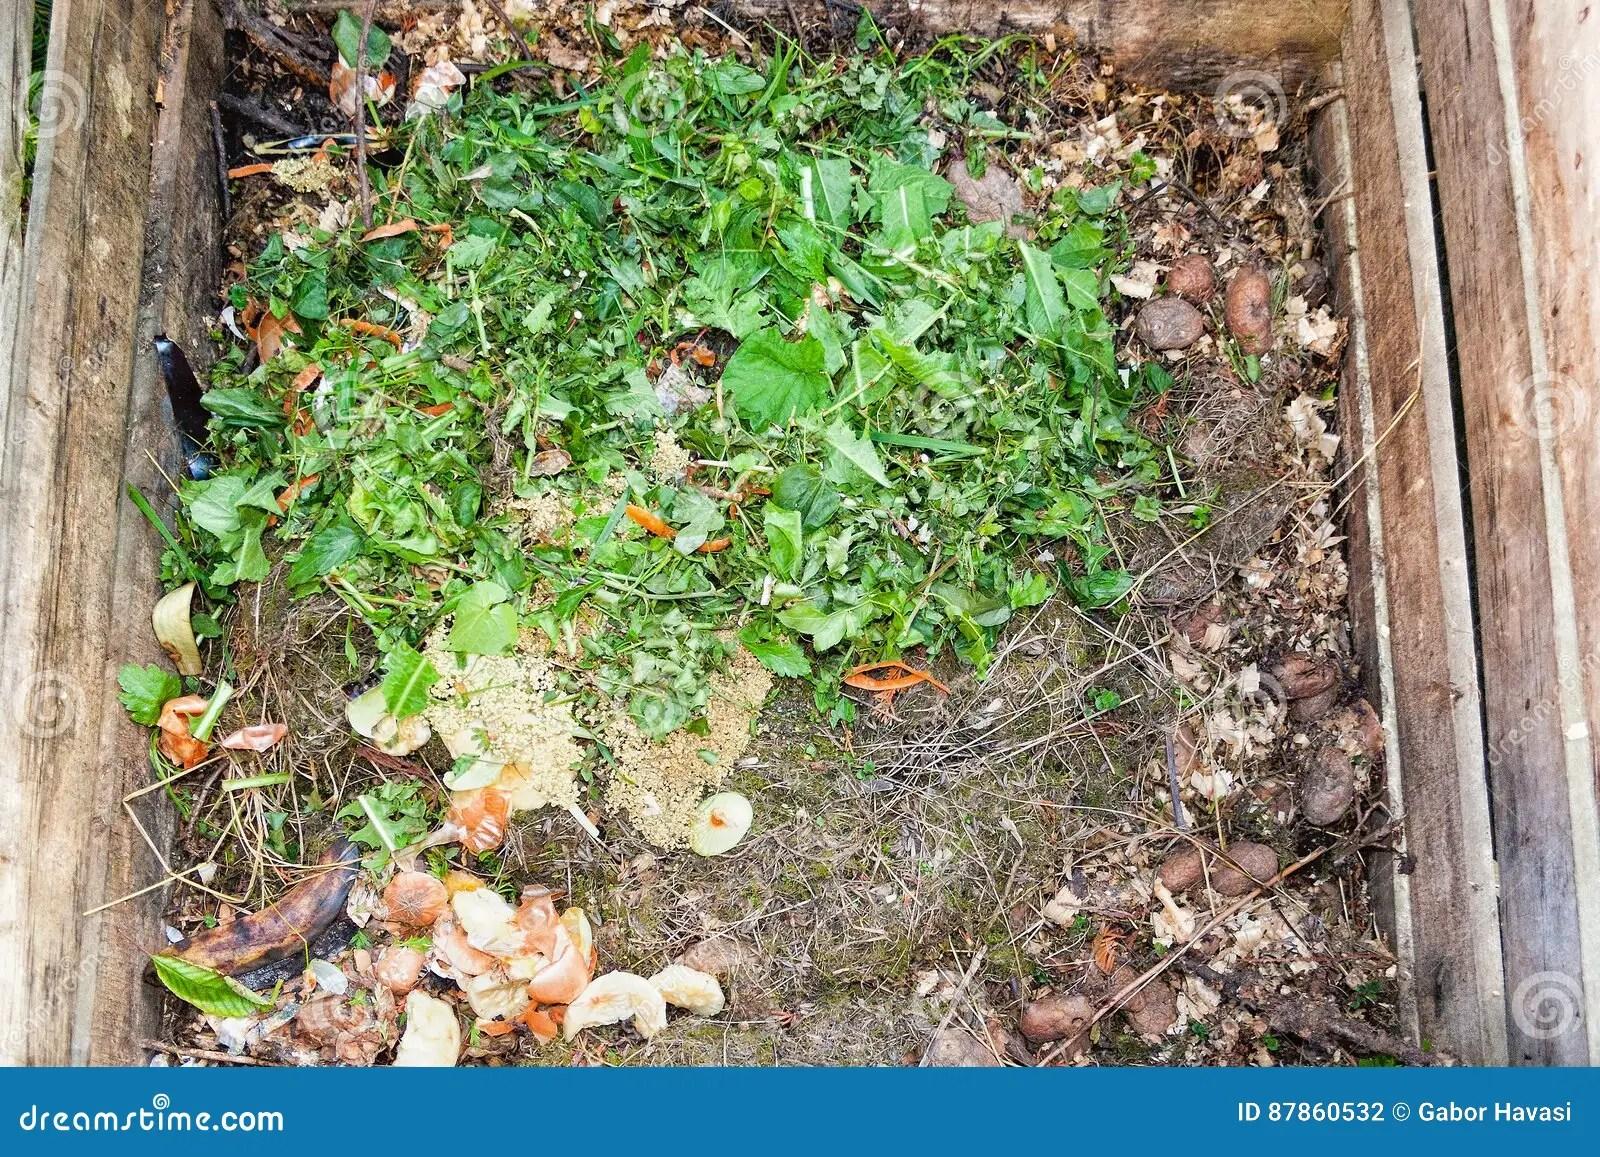 kitchen compost container glass table set for 堆肥材料库存照片 图片包括有工厂 双筒望远镜 食物 友好 楼梯栏杆 堆肥在天然肥料堆的材料